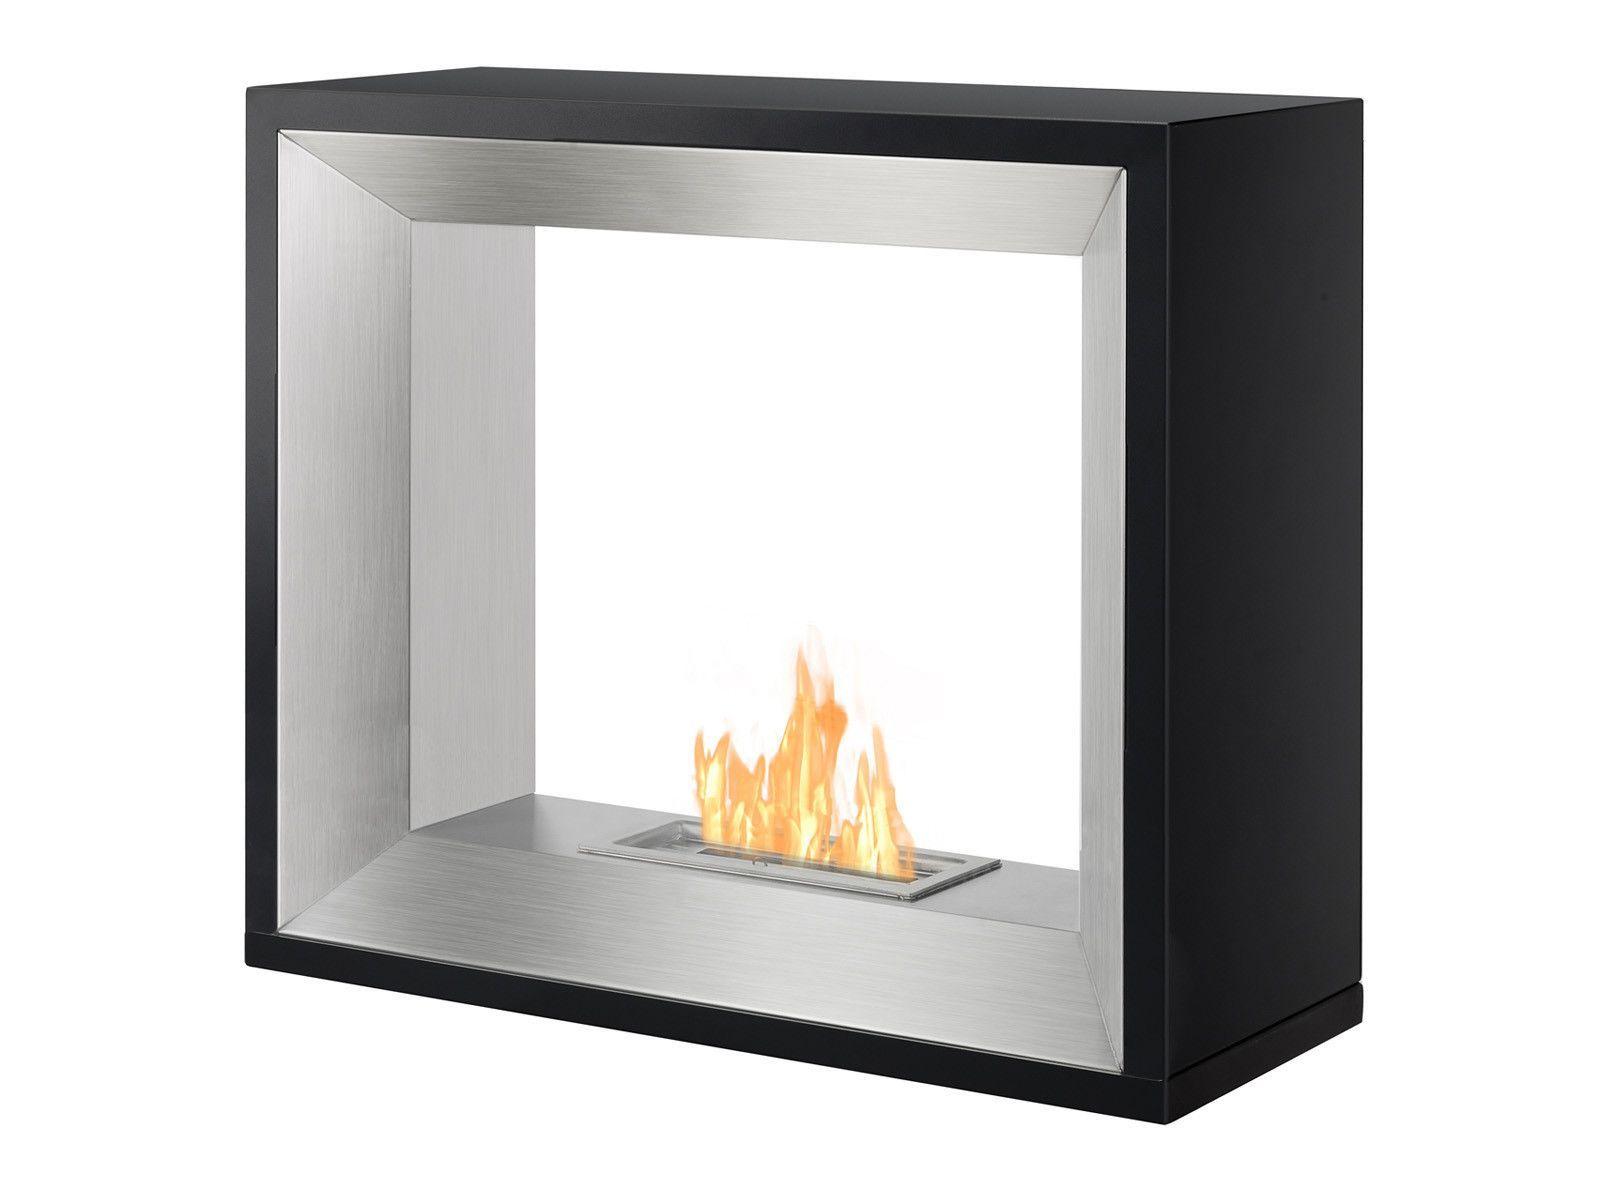 tempo freestanding ventless ethanol fireplace ethanol fireplace